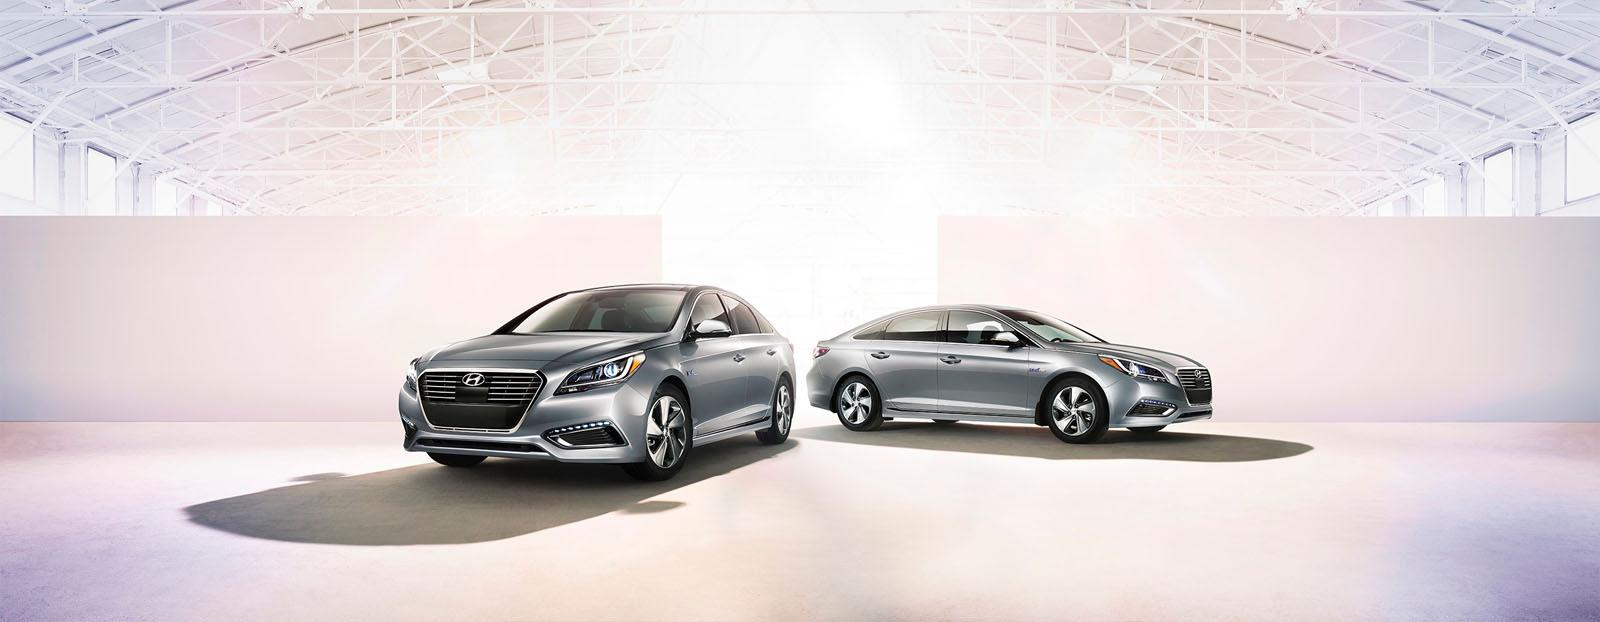 2011 Hyundai Sonata Recalls  CarComplaintscom